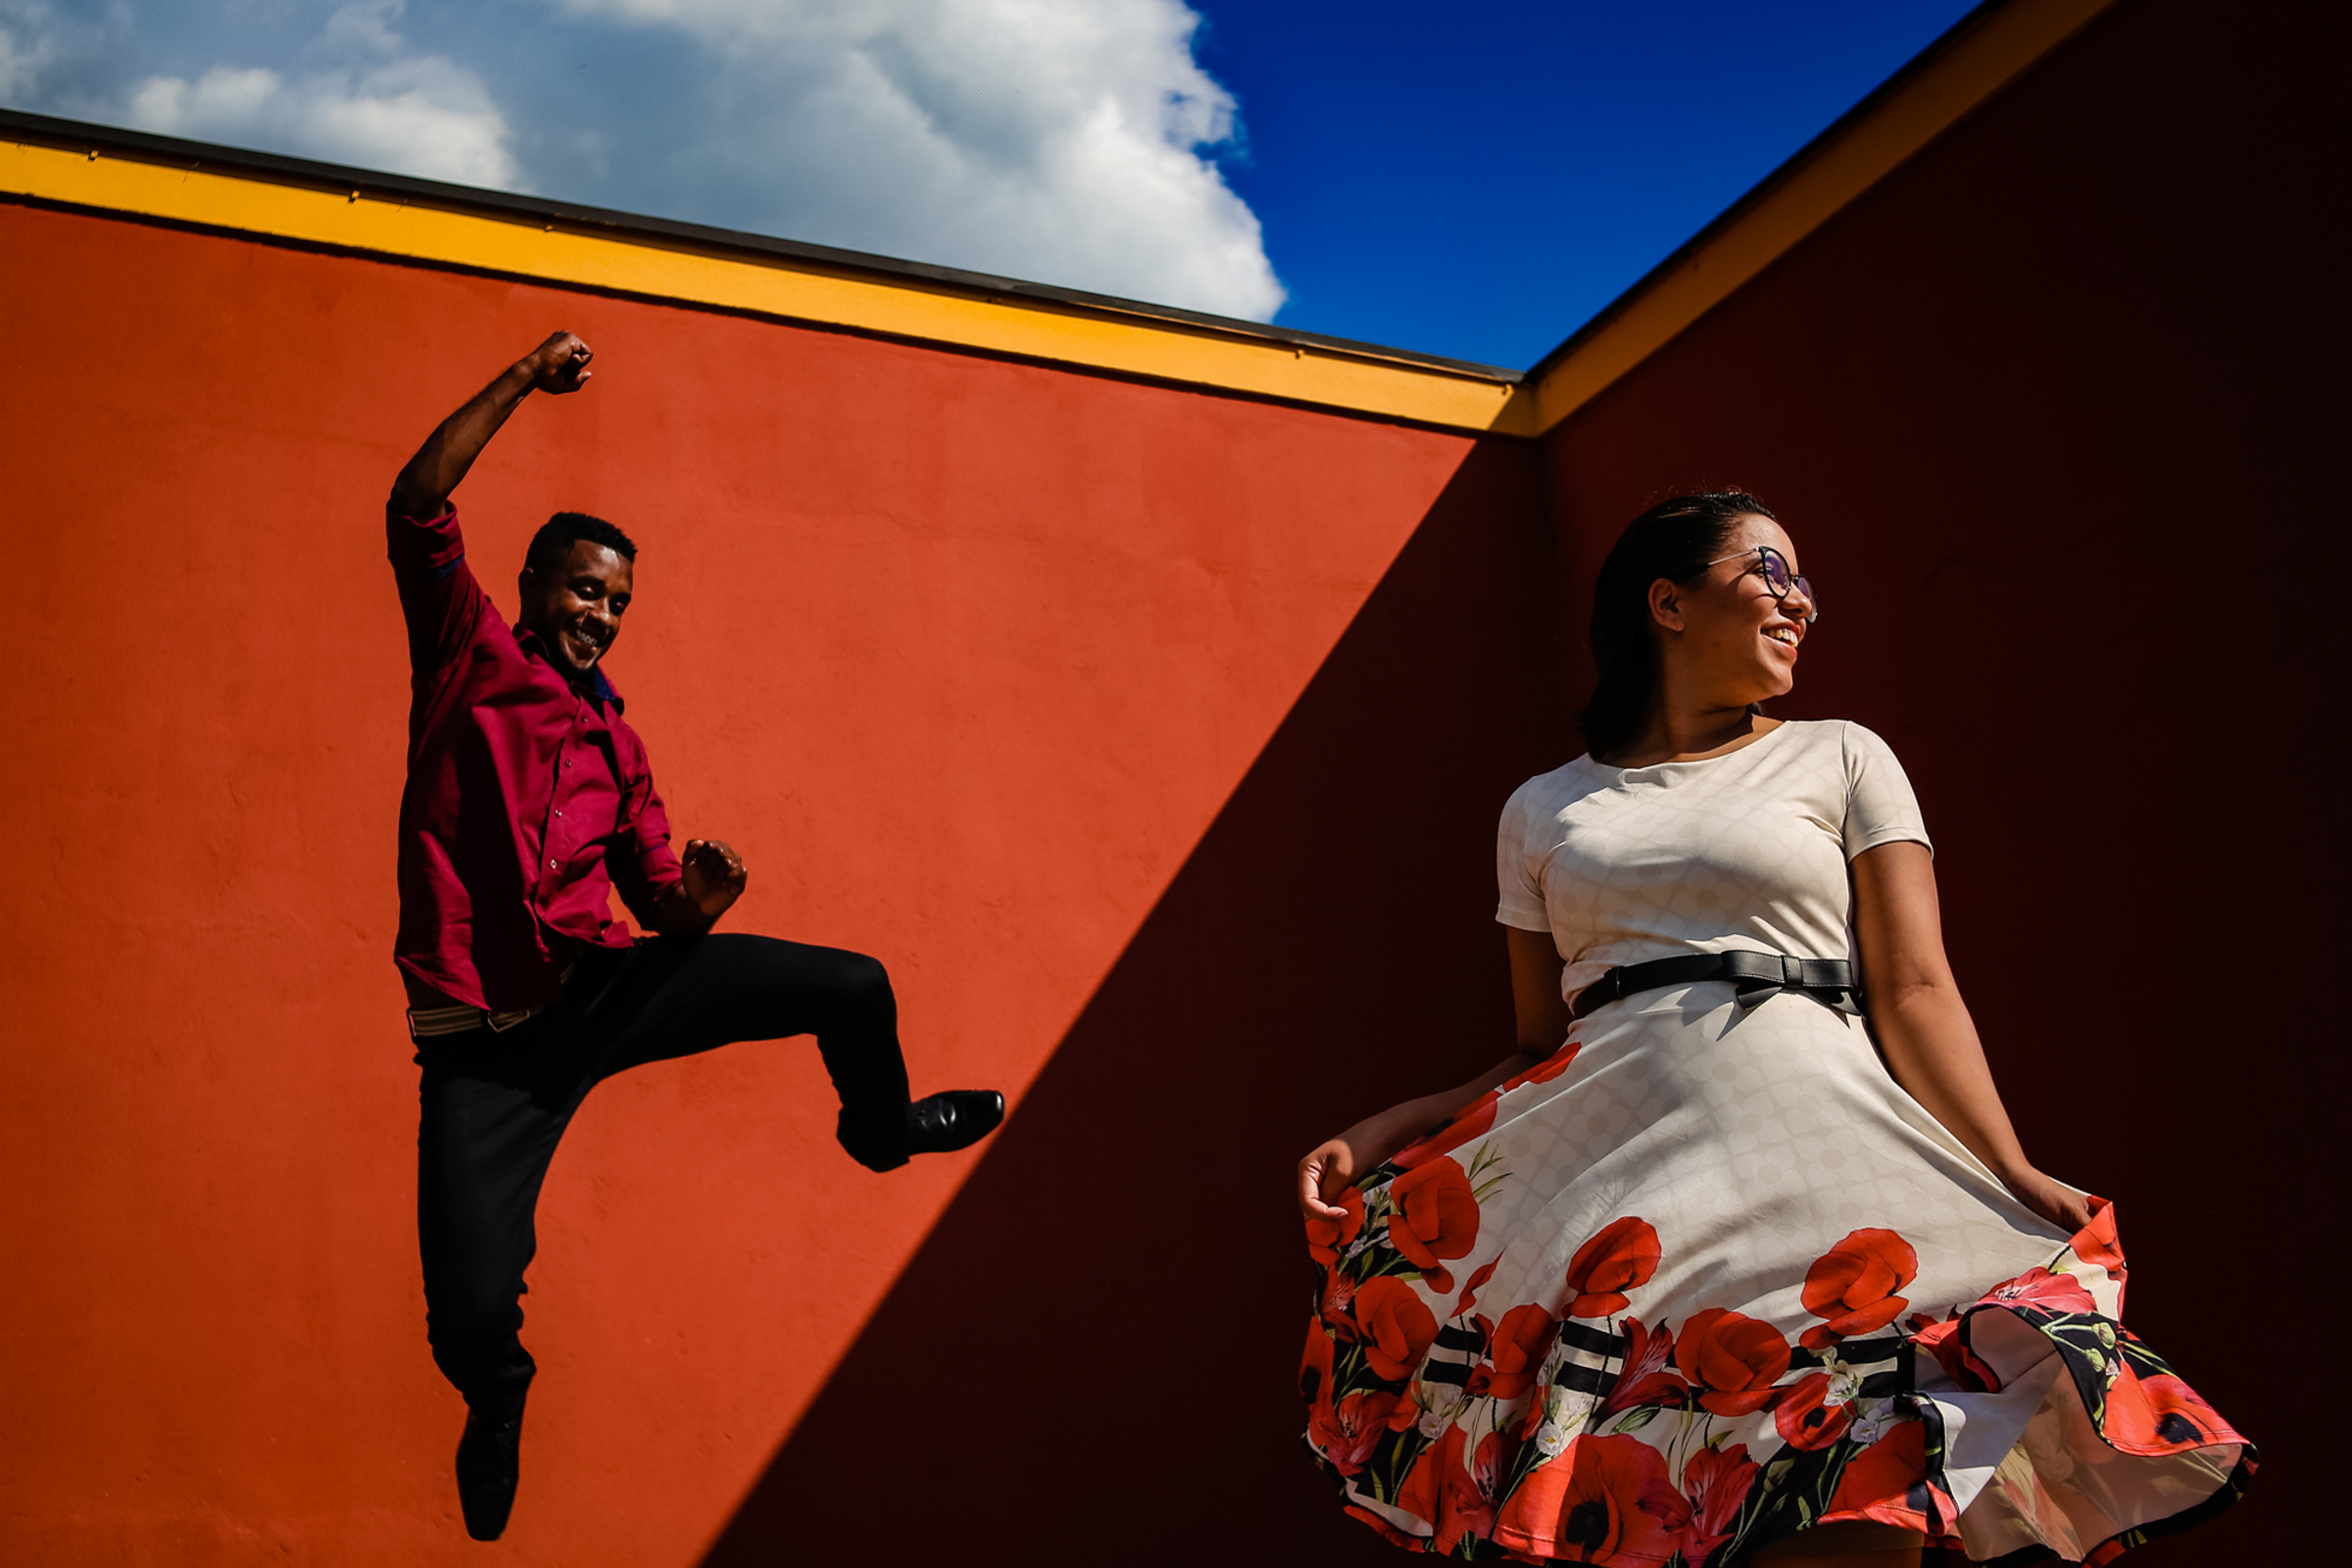 Colorful engagement photo in creative composition - photo by Área da Fotografia